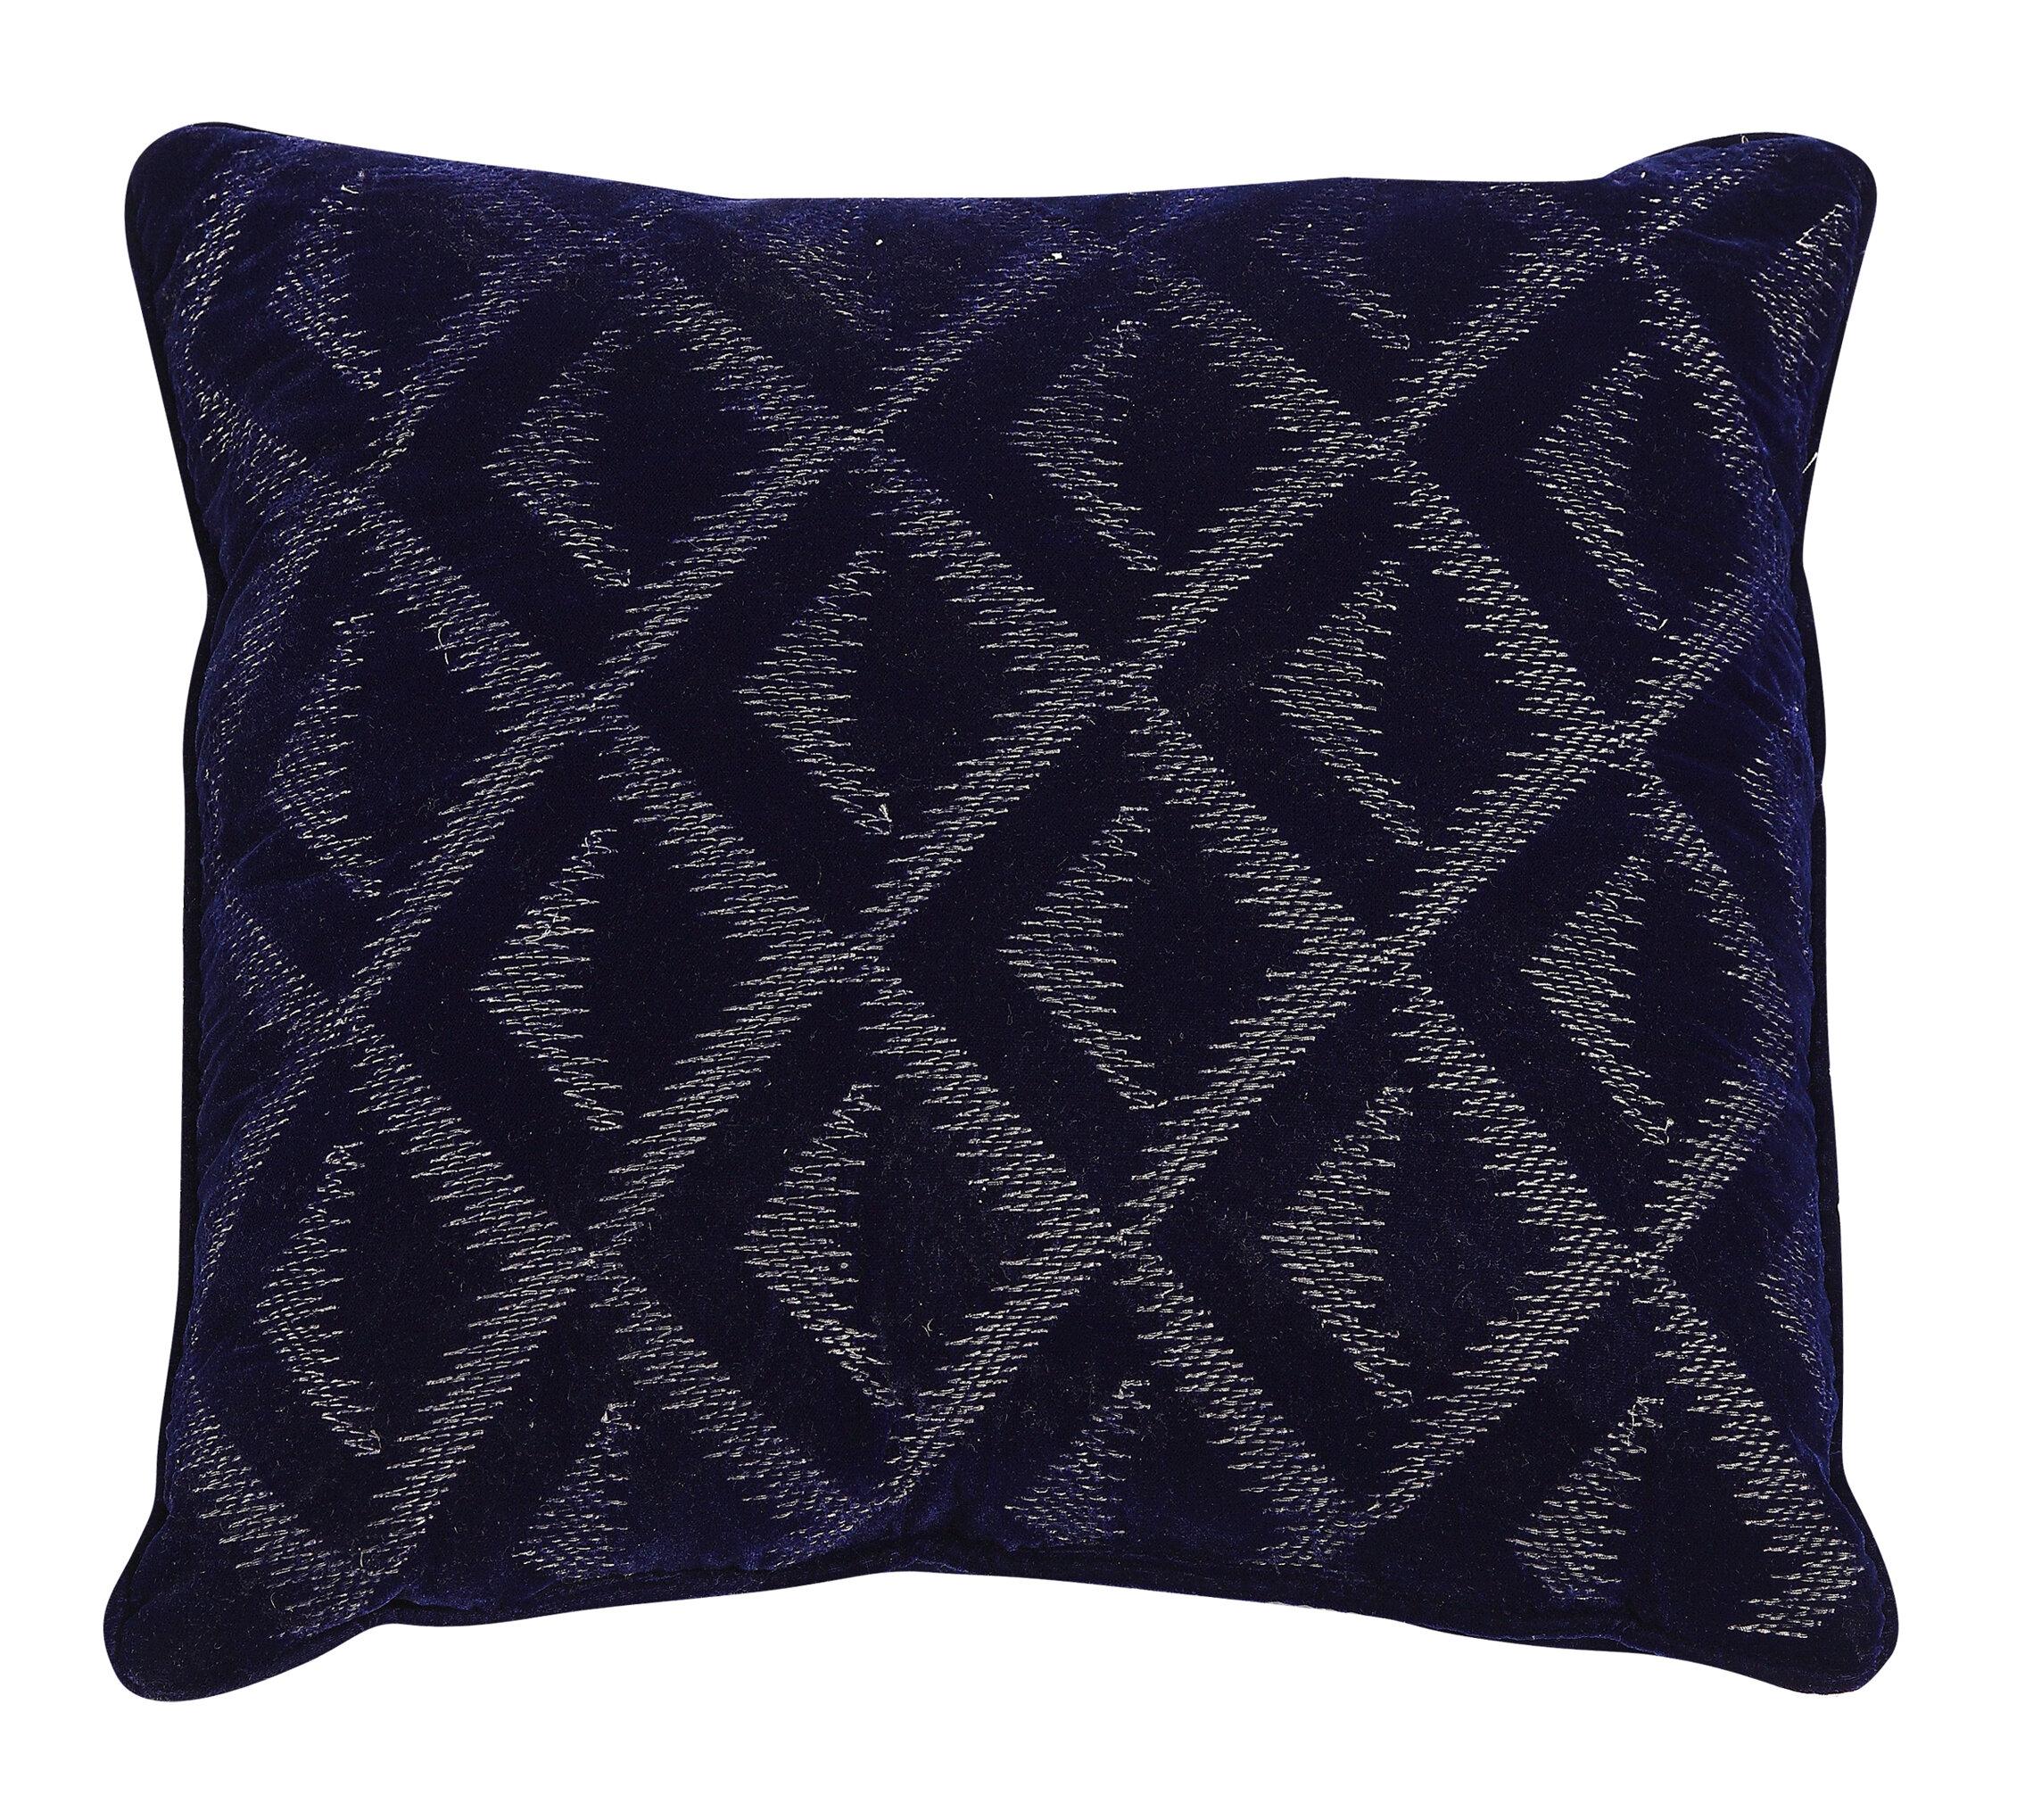 Preferred Jane Seymour Designs | Wayfair ZR77